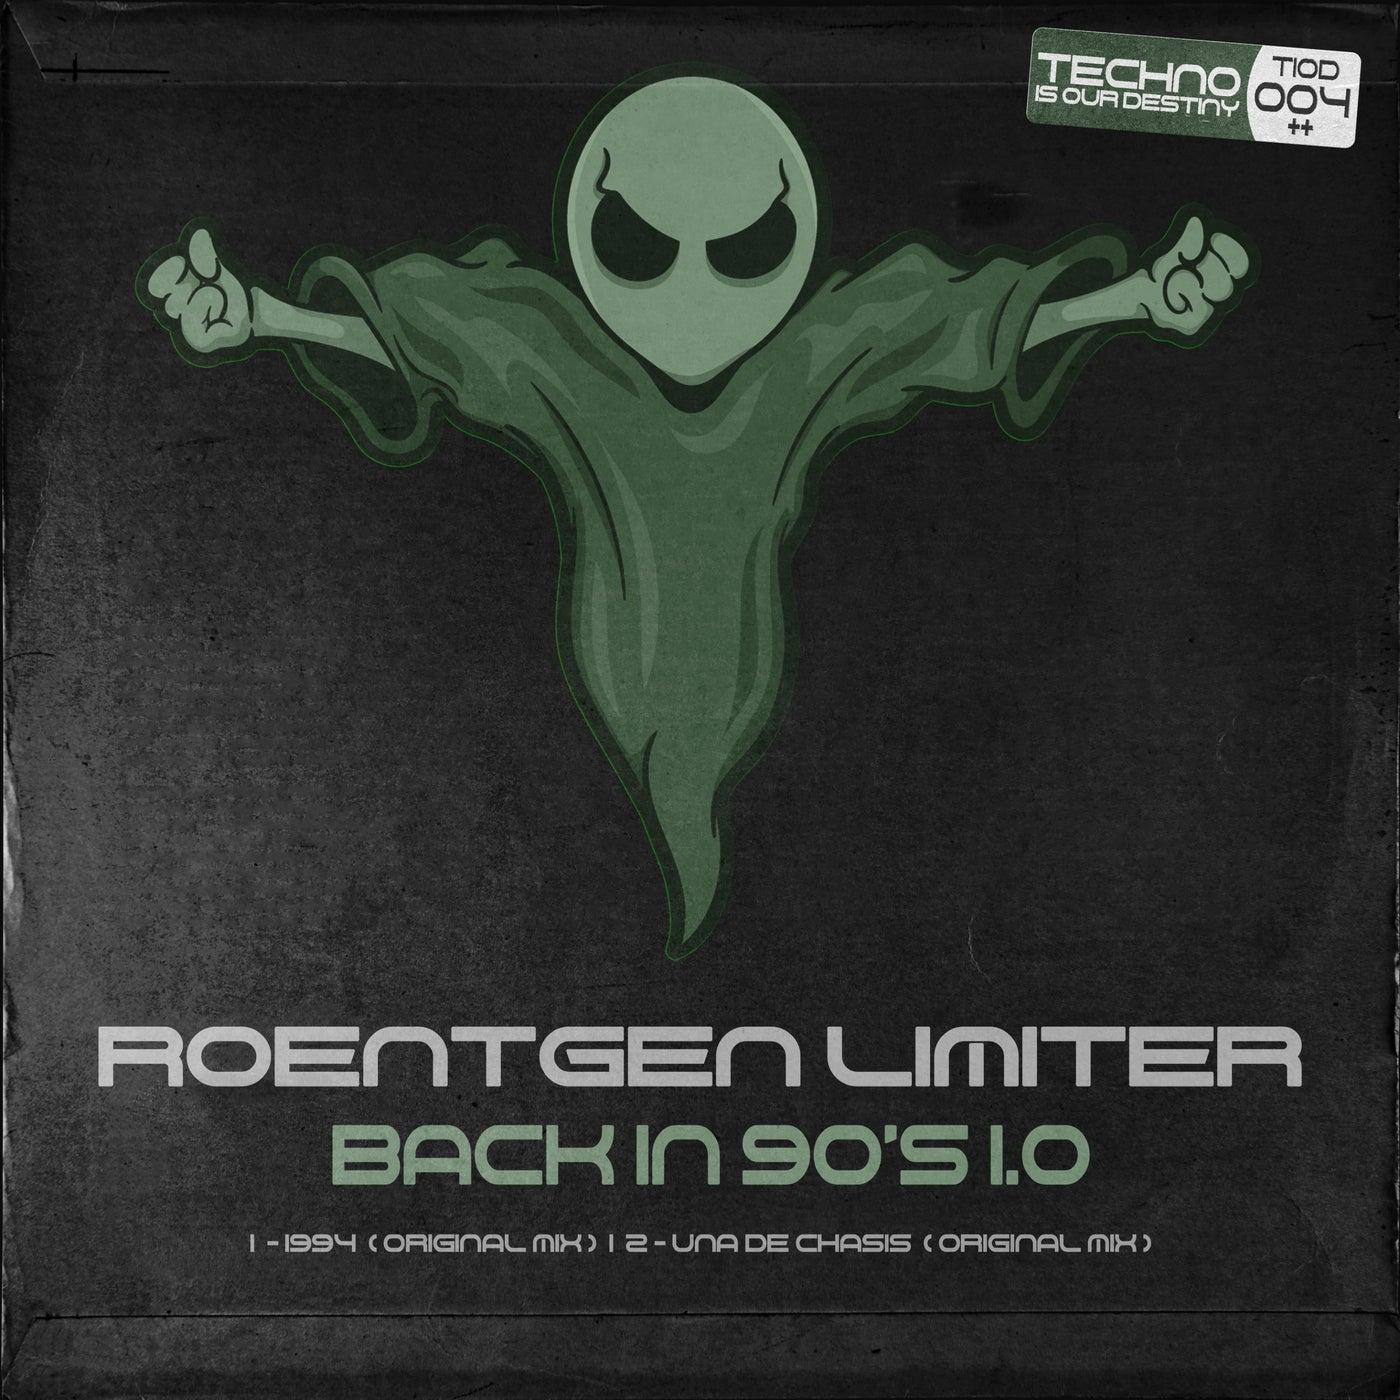 1994 (Original Mix)